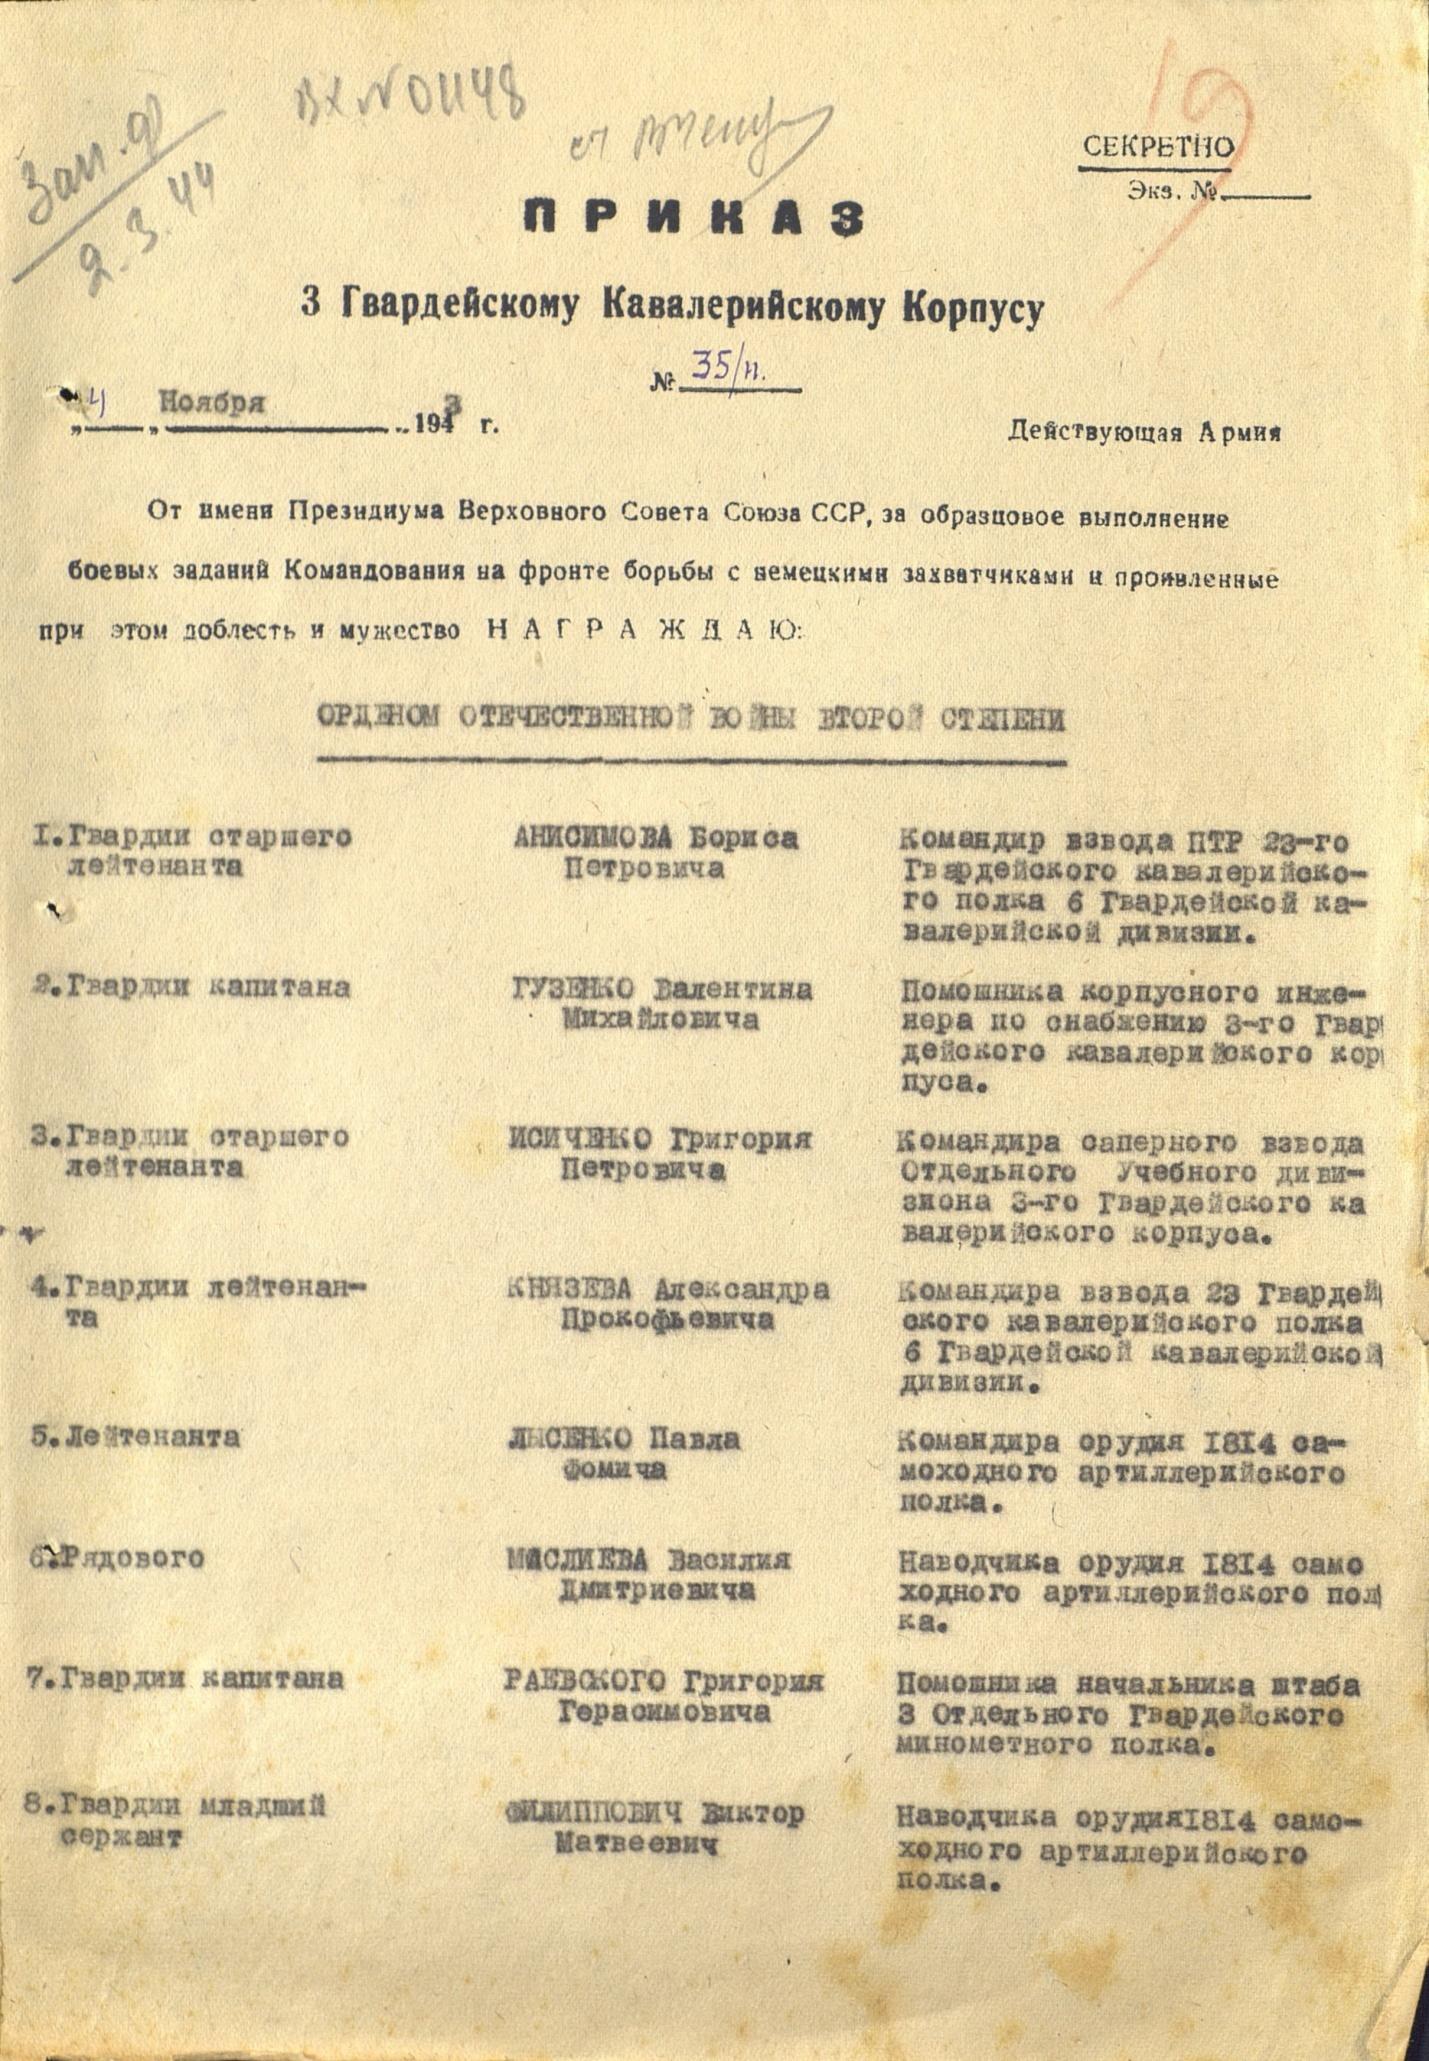 C:\Documents and Settings\Фёдор\Мои документы\История\Маслиев\1.jpg